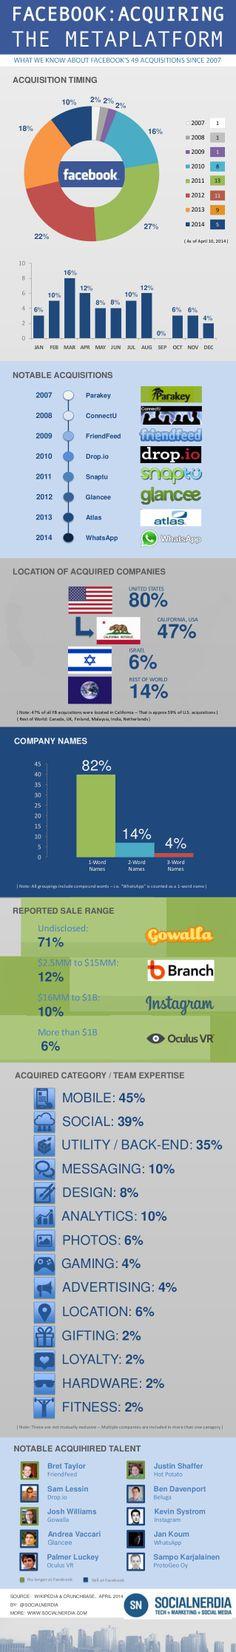 FaceBook acquiring the Metaplatform #infografia #infographic #socialmedia